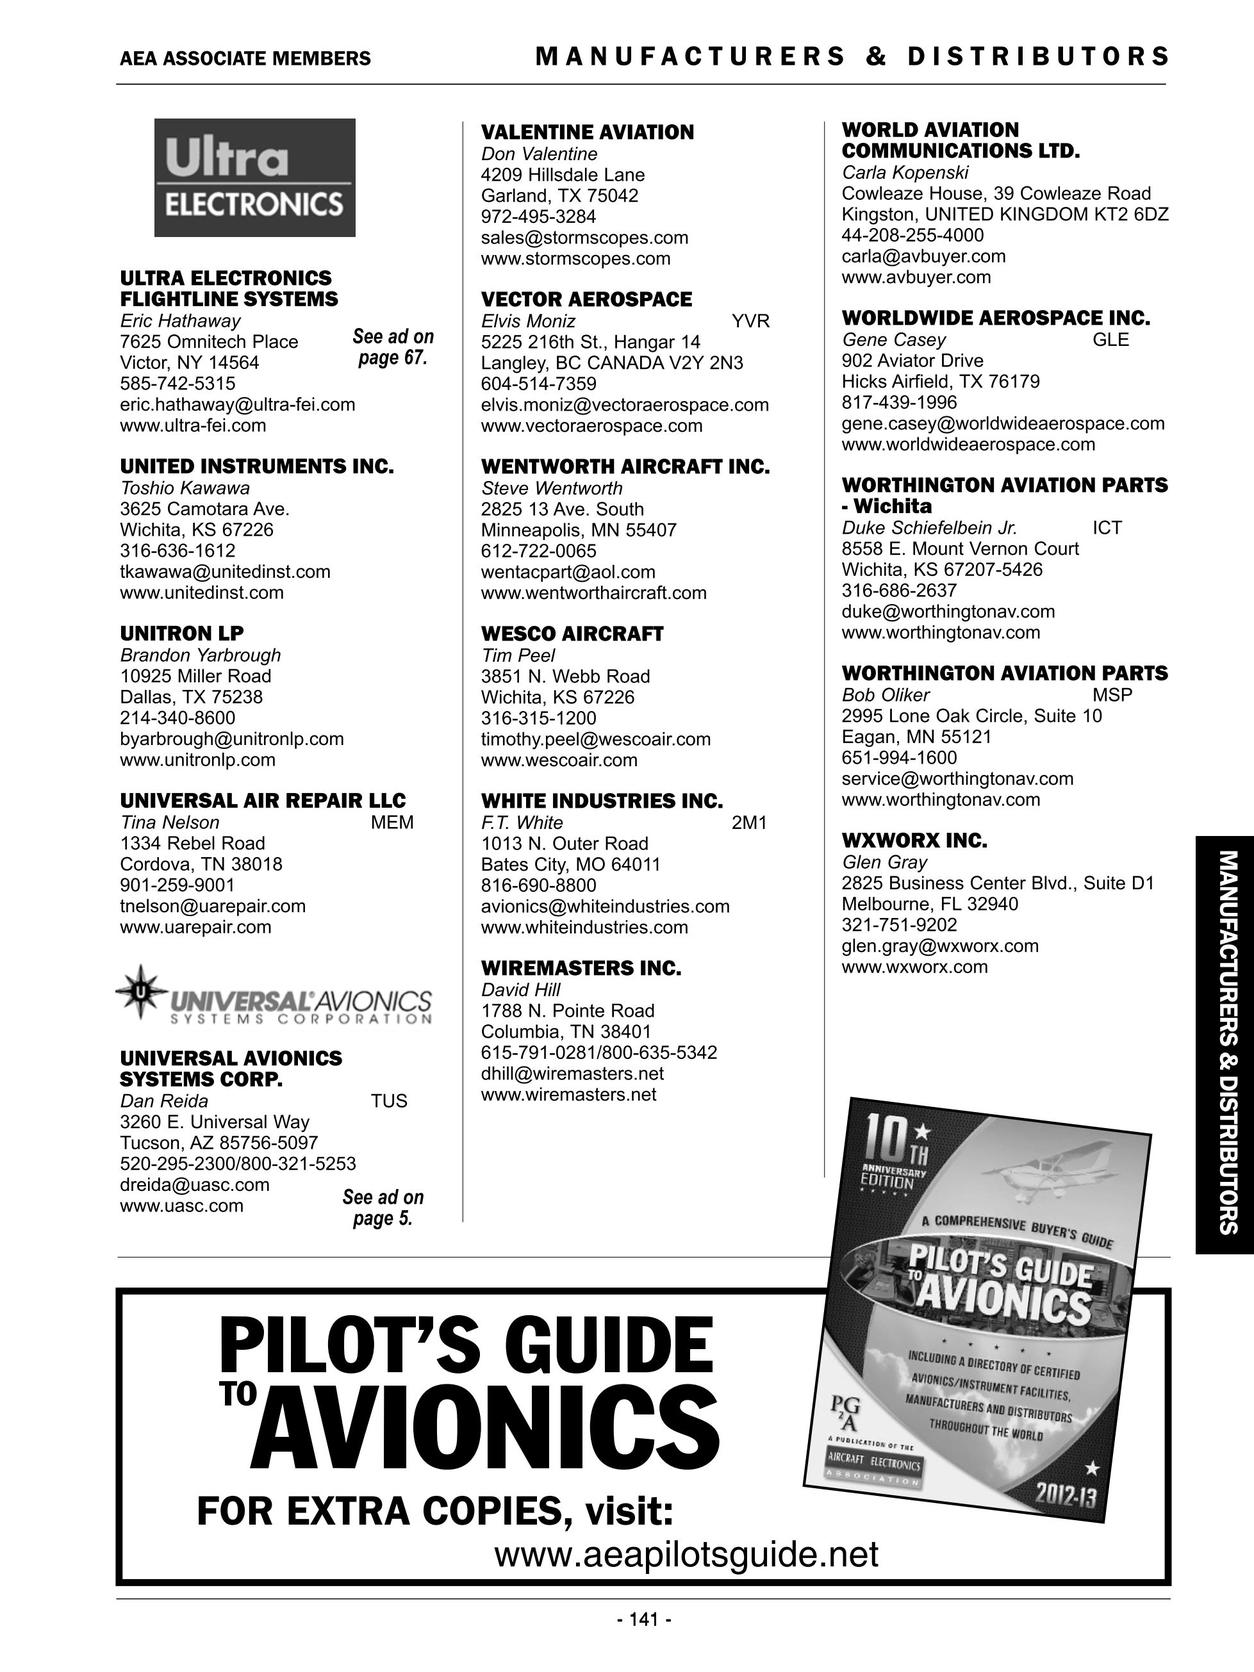 Pilot\'s Guide to Avionics 2012-2013